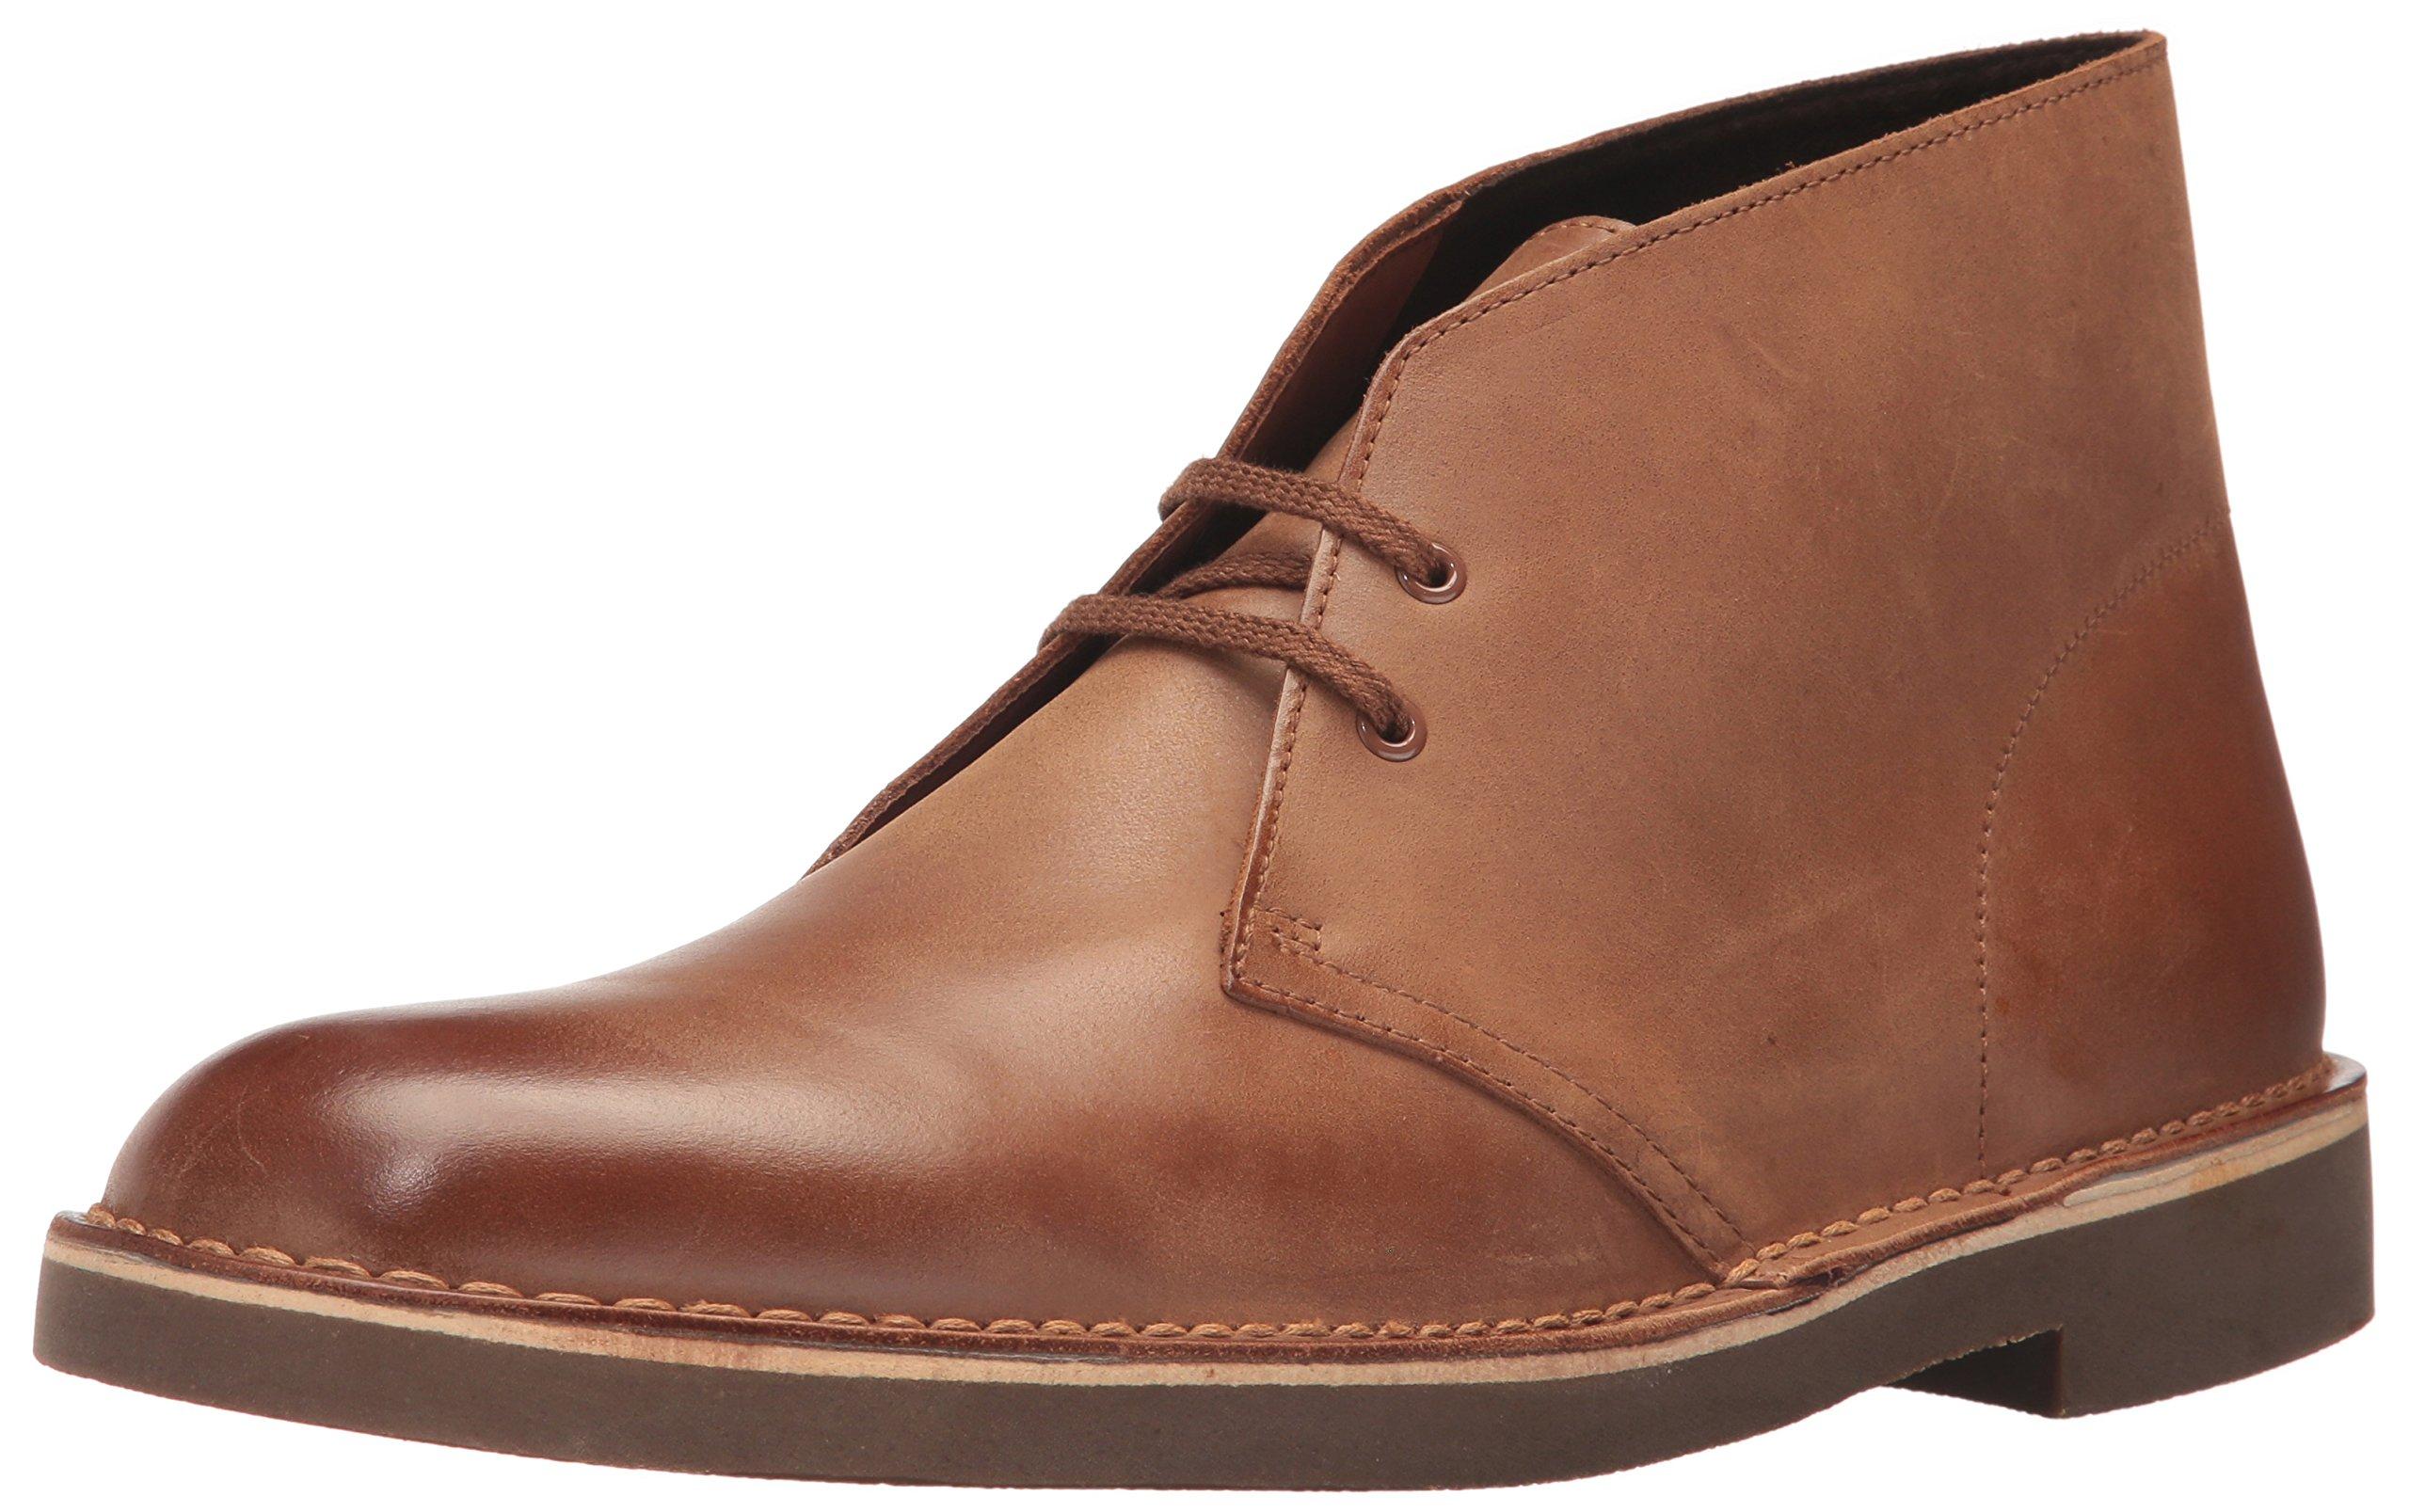 Clarks Men's Bushacre 2 Chukka Boot dark tan leather 12 M US